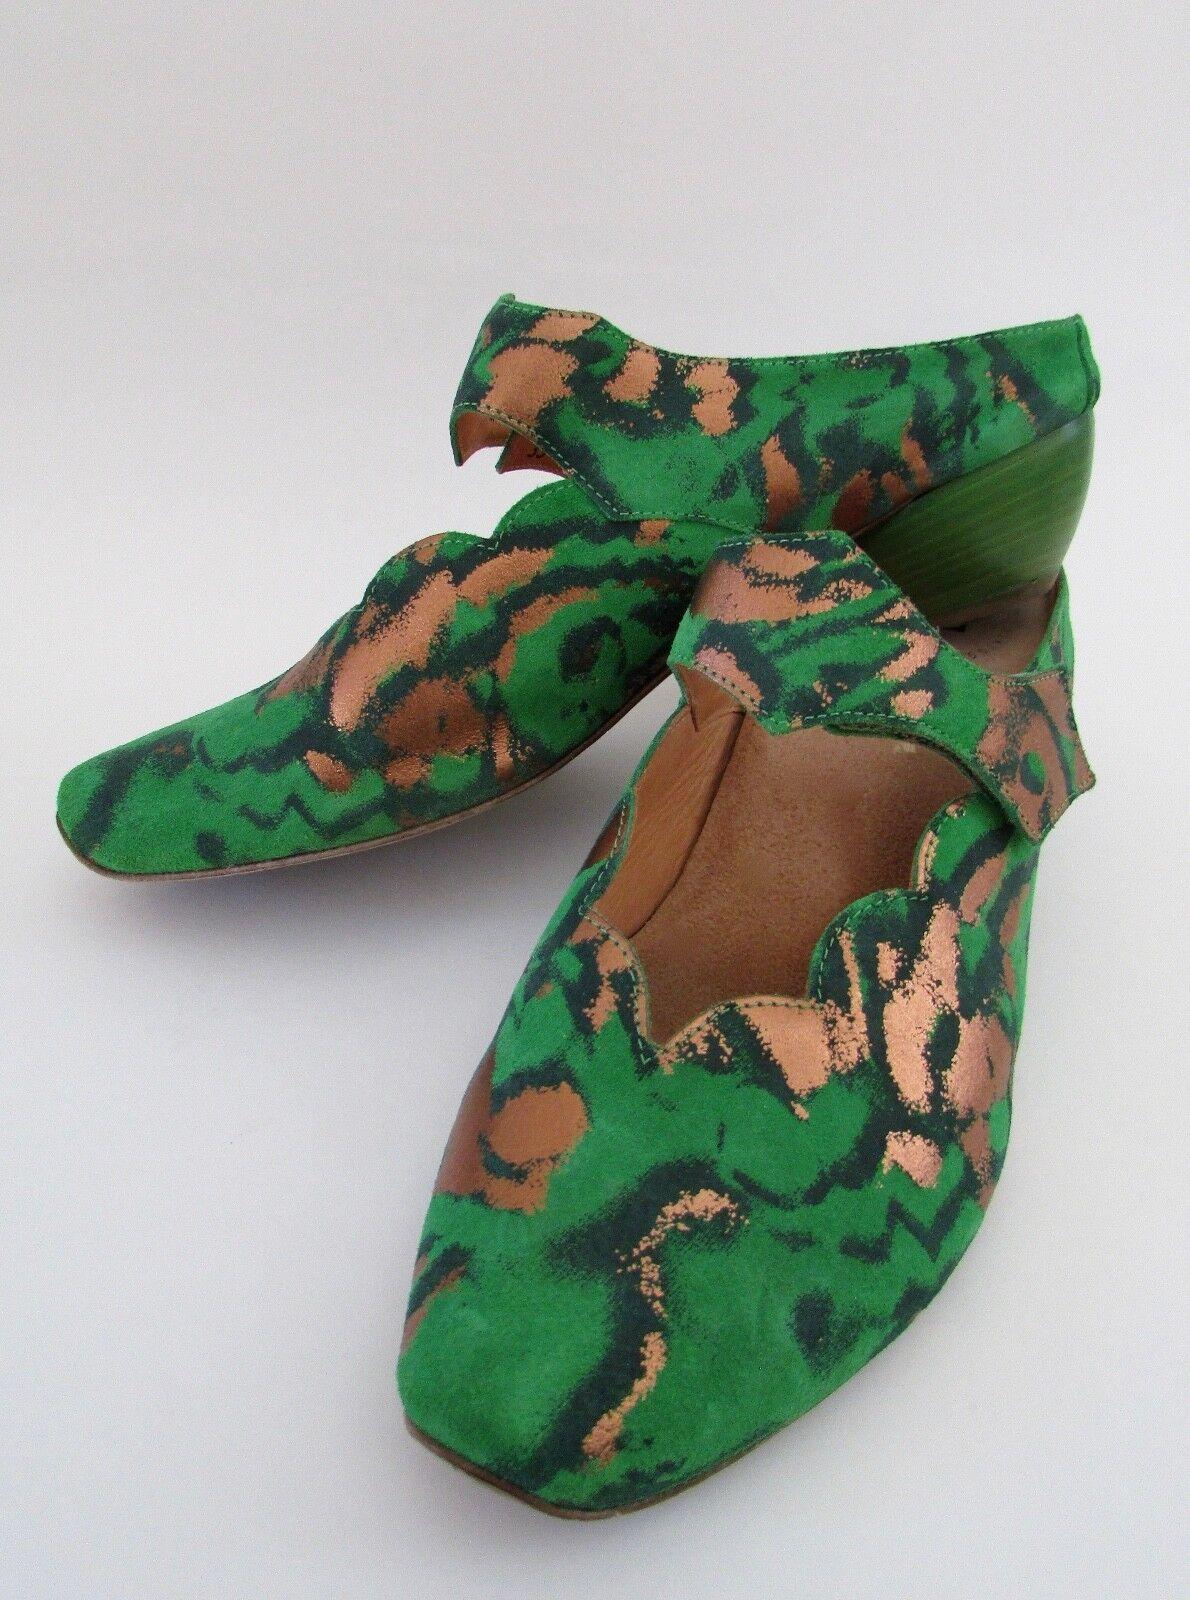 Think   Green Suede Copper Metallic Slide Mules Sz 43 10.5